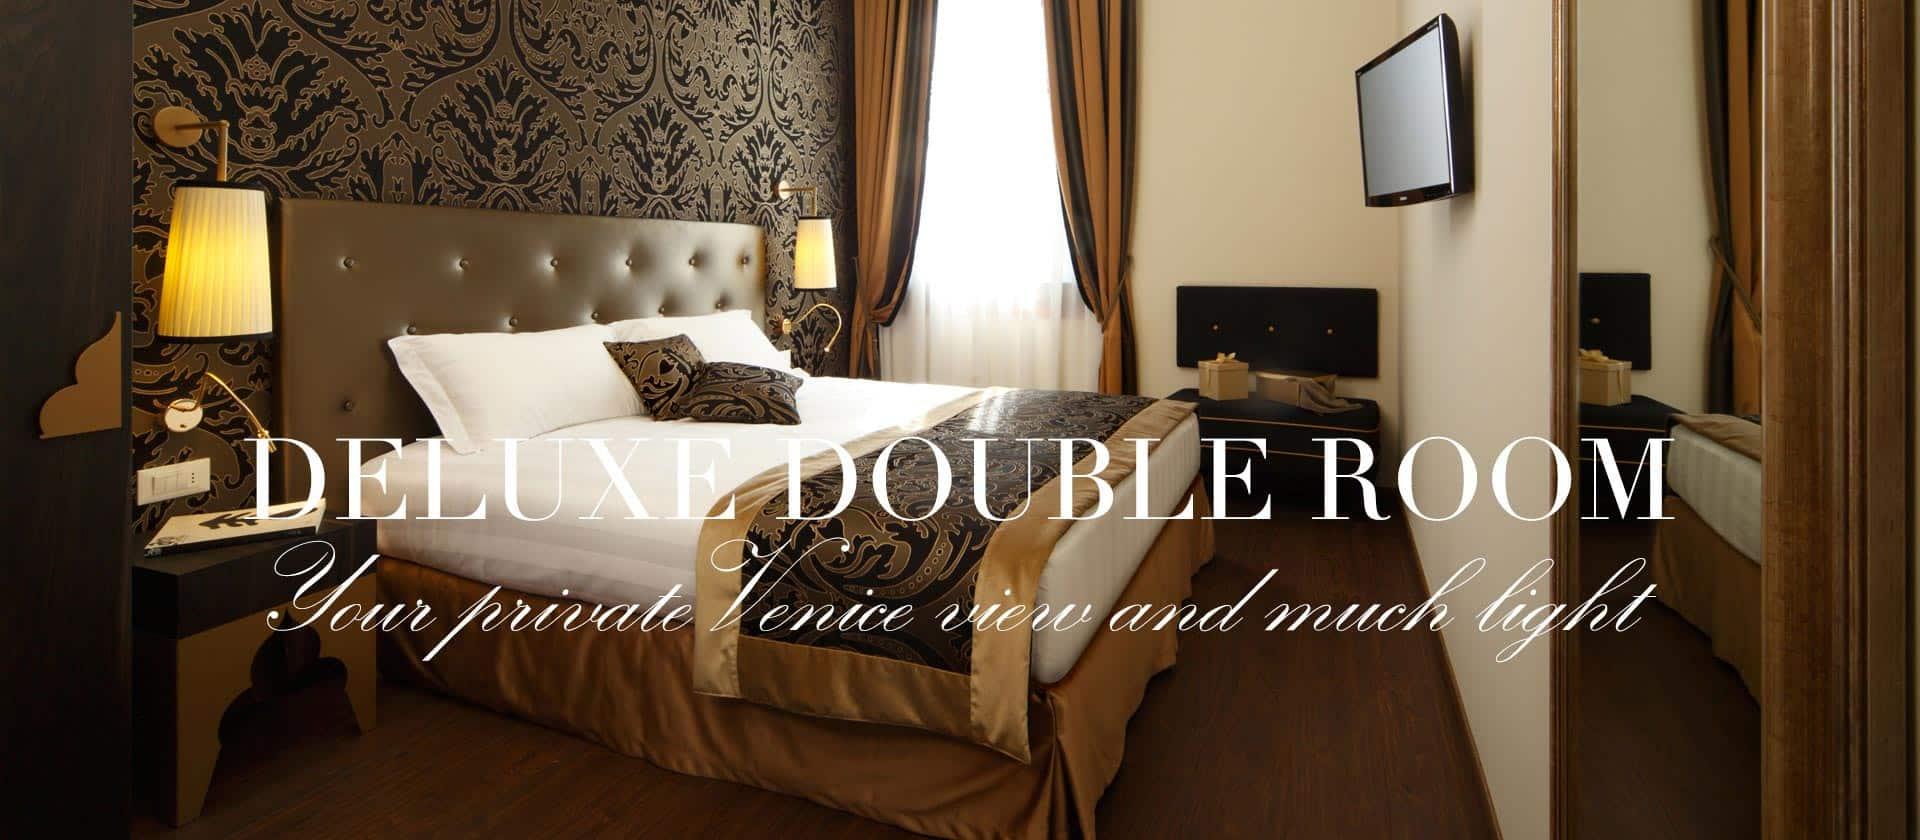 Deluxe Double